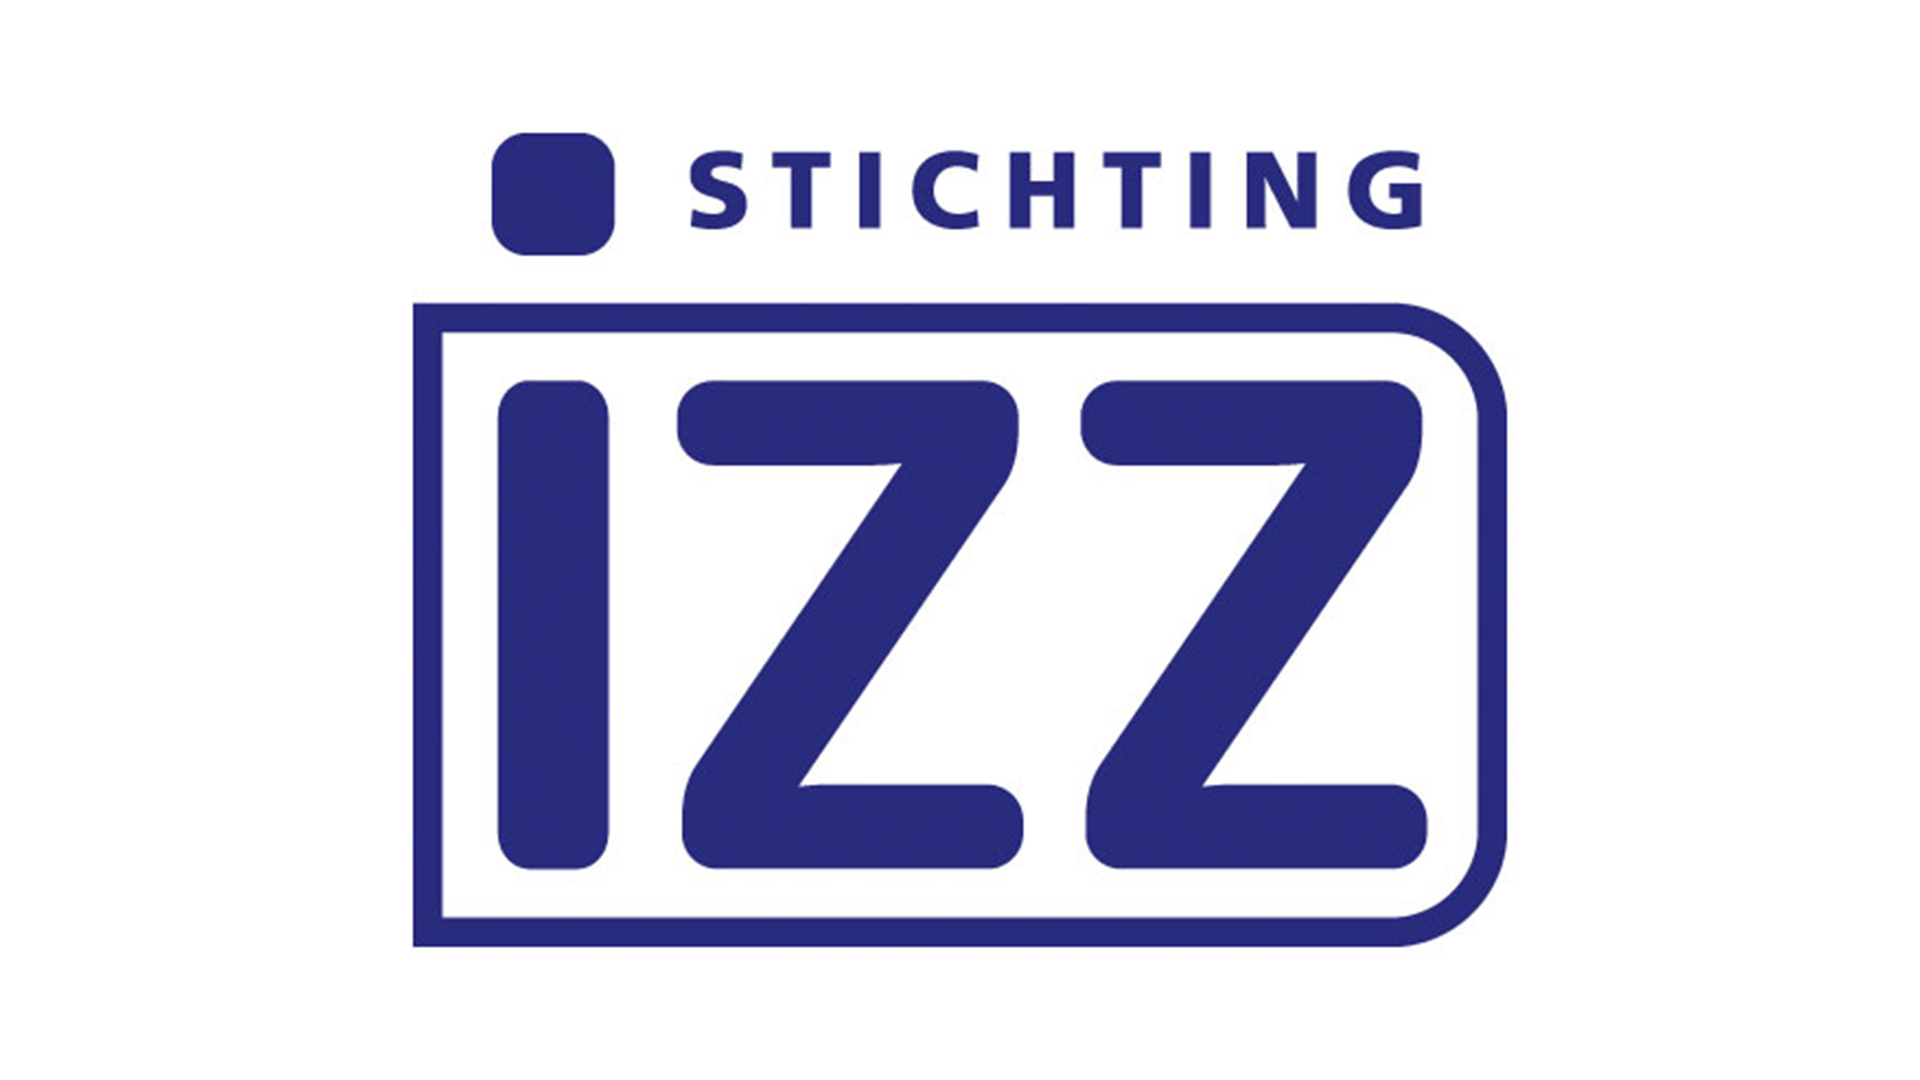 STICHTINGIZZ.png